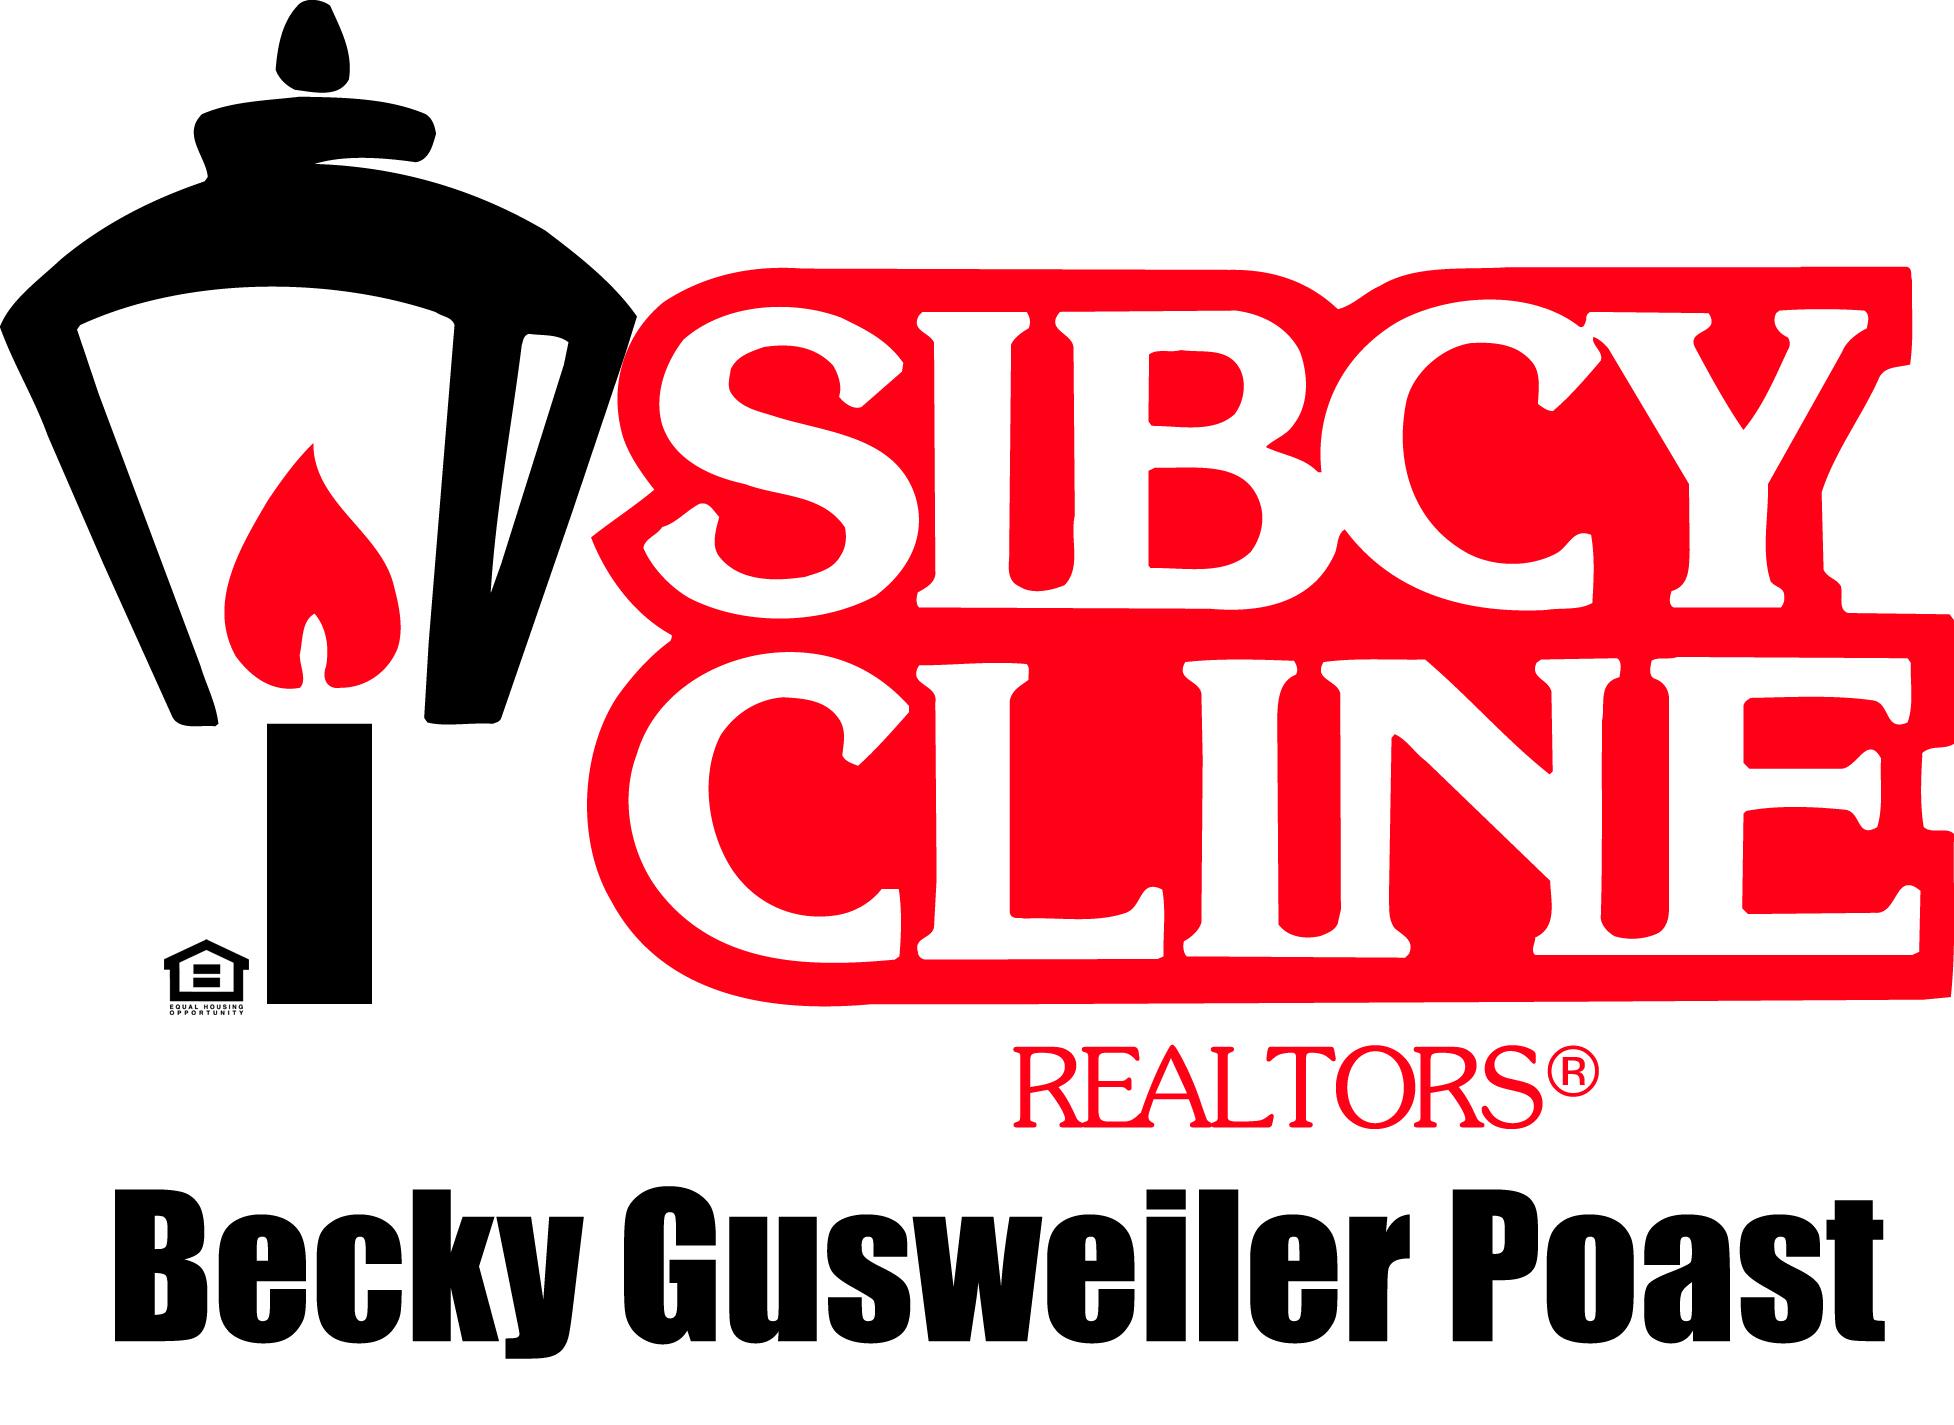 becky poast logo.jpg